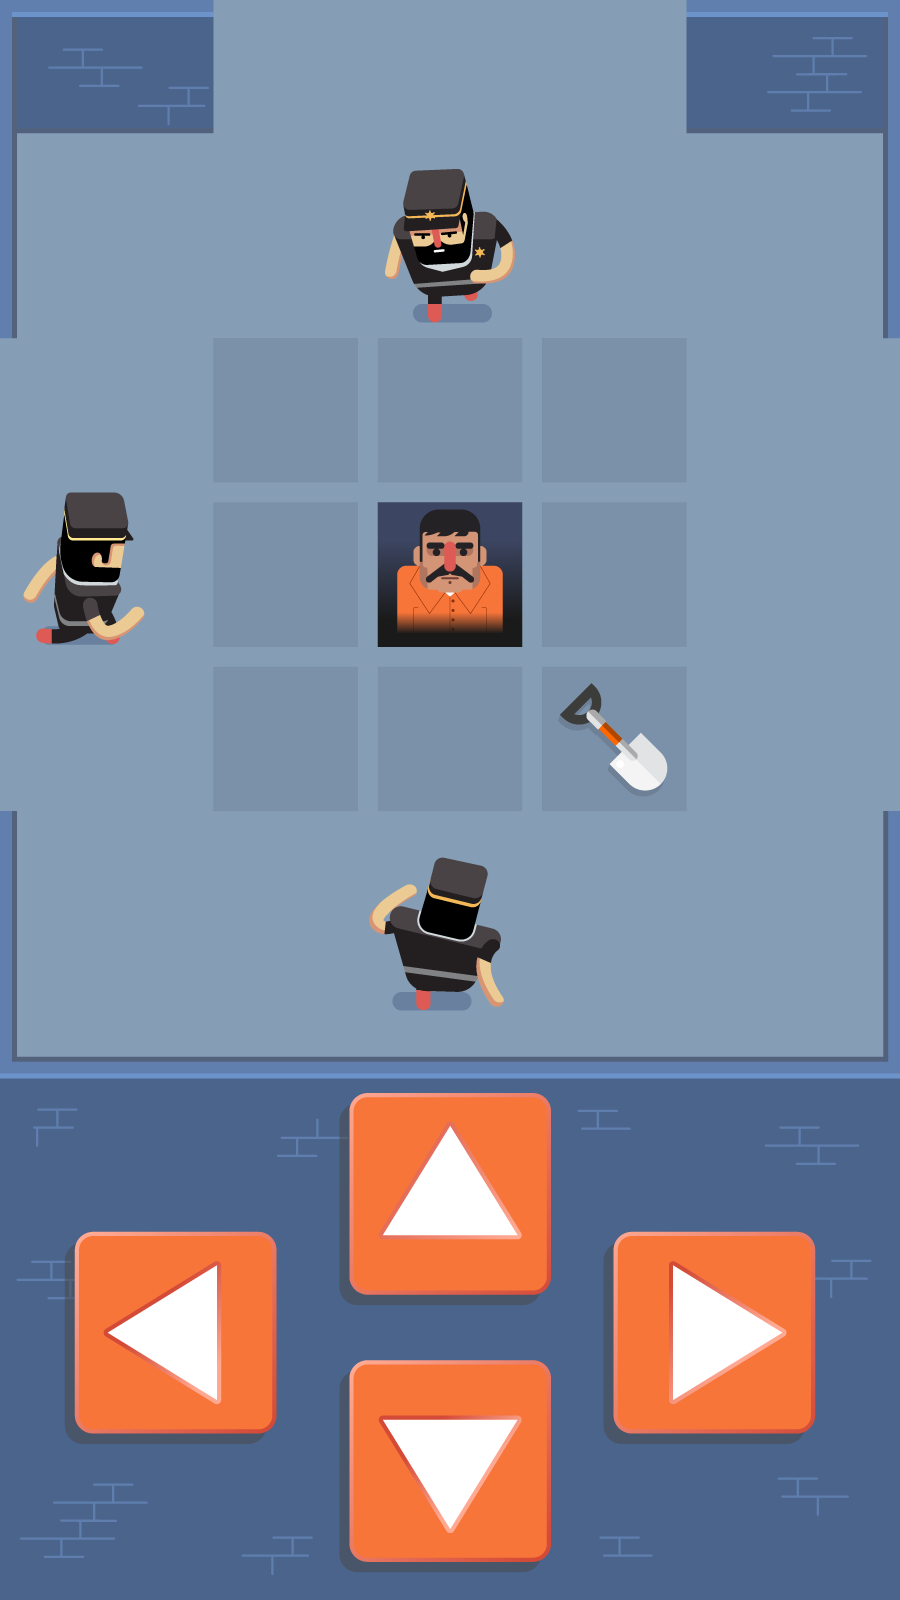 Smove_ElChapo_GameplayExample.png